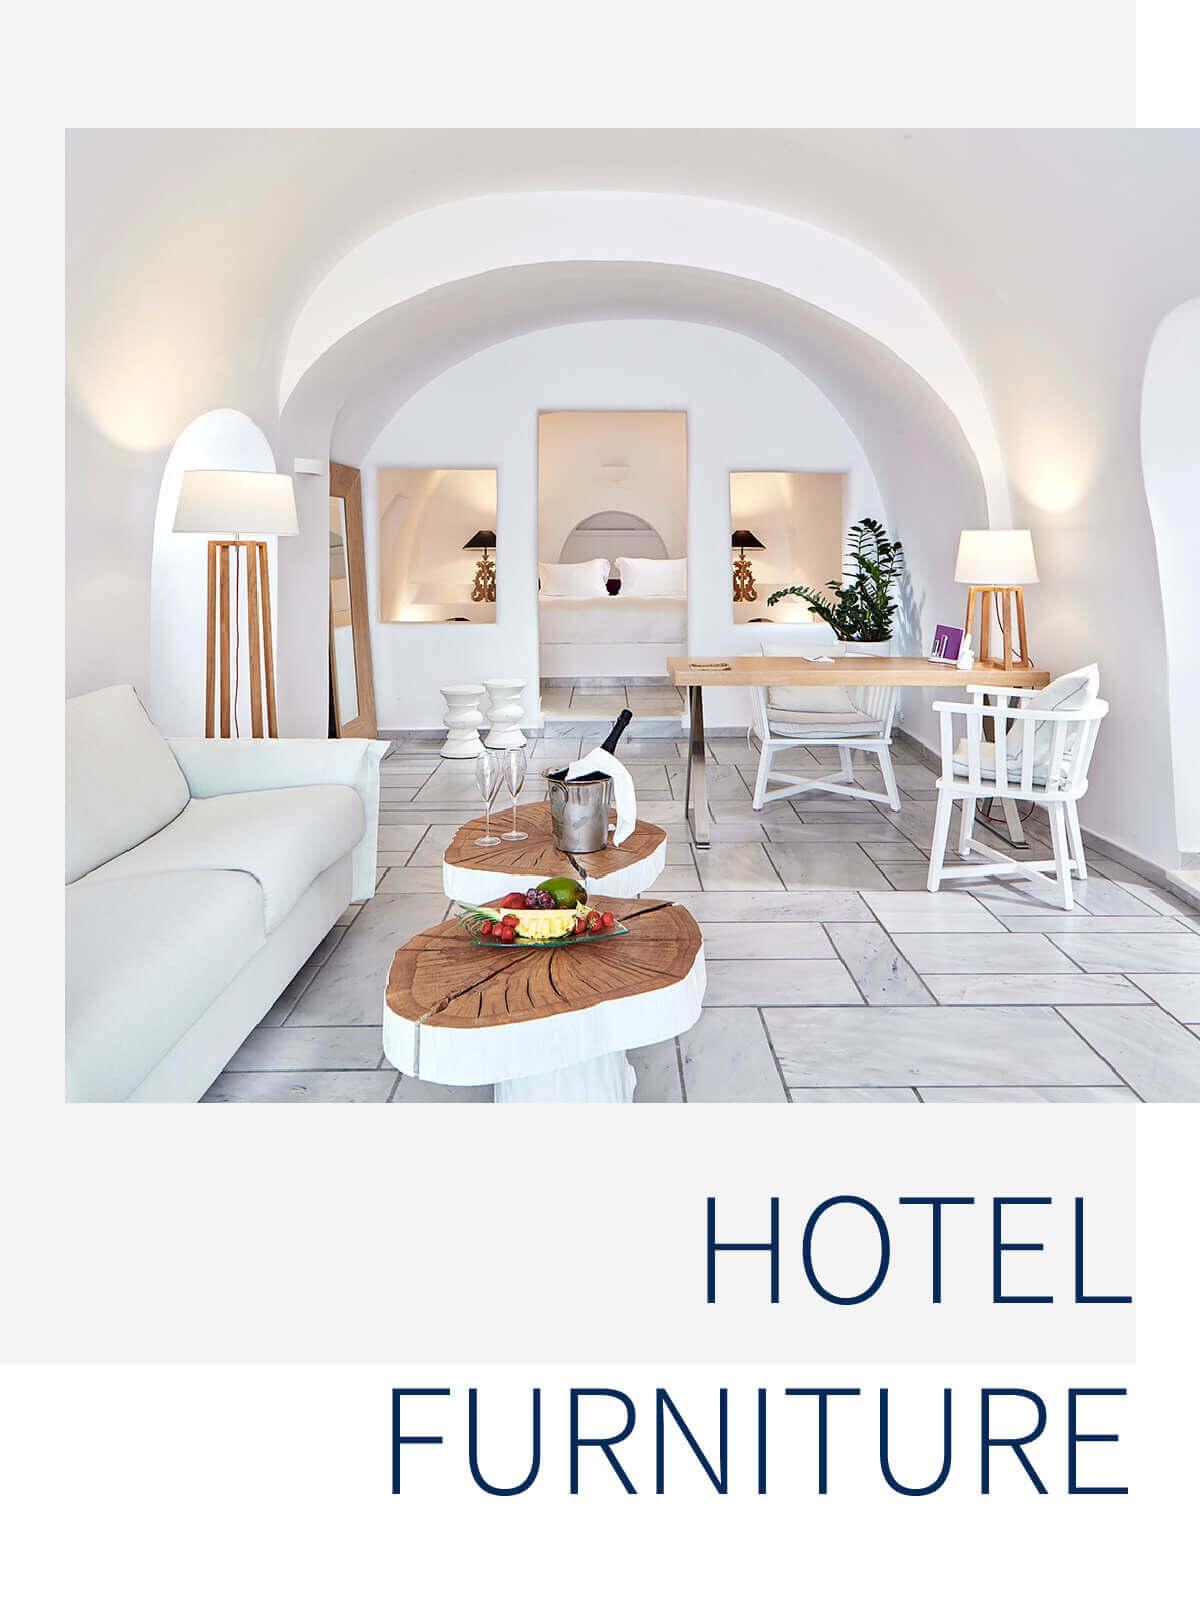 160a8bd0fa4 Έπιπλα Ξενοδοχείου & Ειδικές Κατασκευές   ΑΦΟΙ ΤΖΟΥΜΑΝΗ